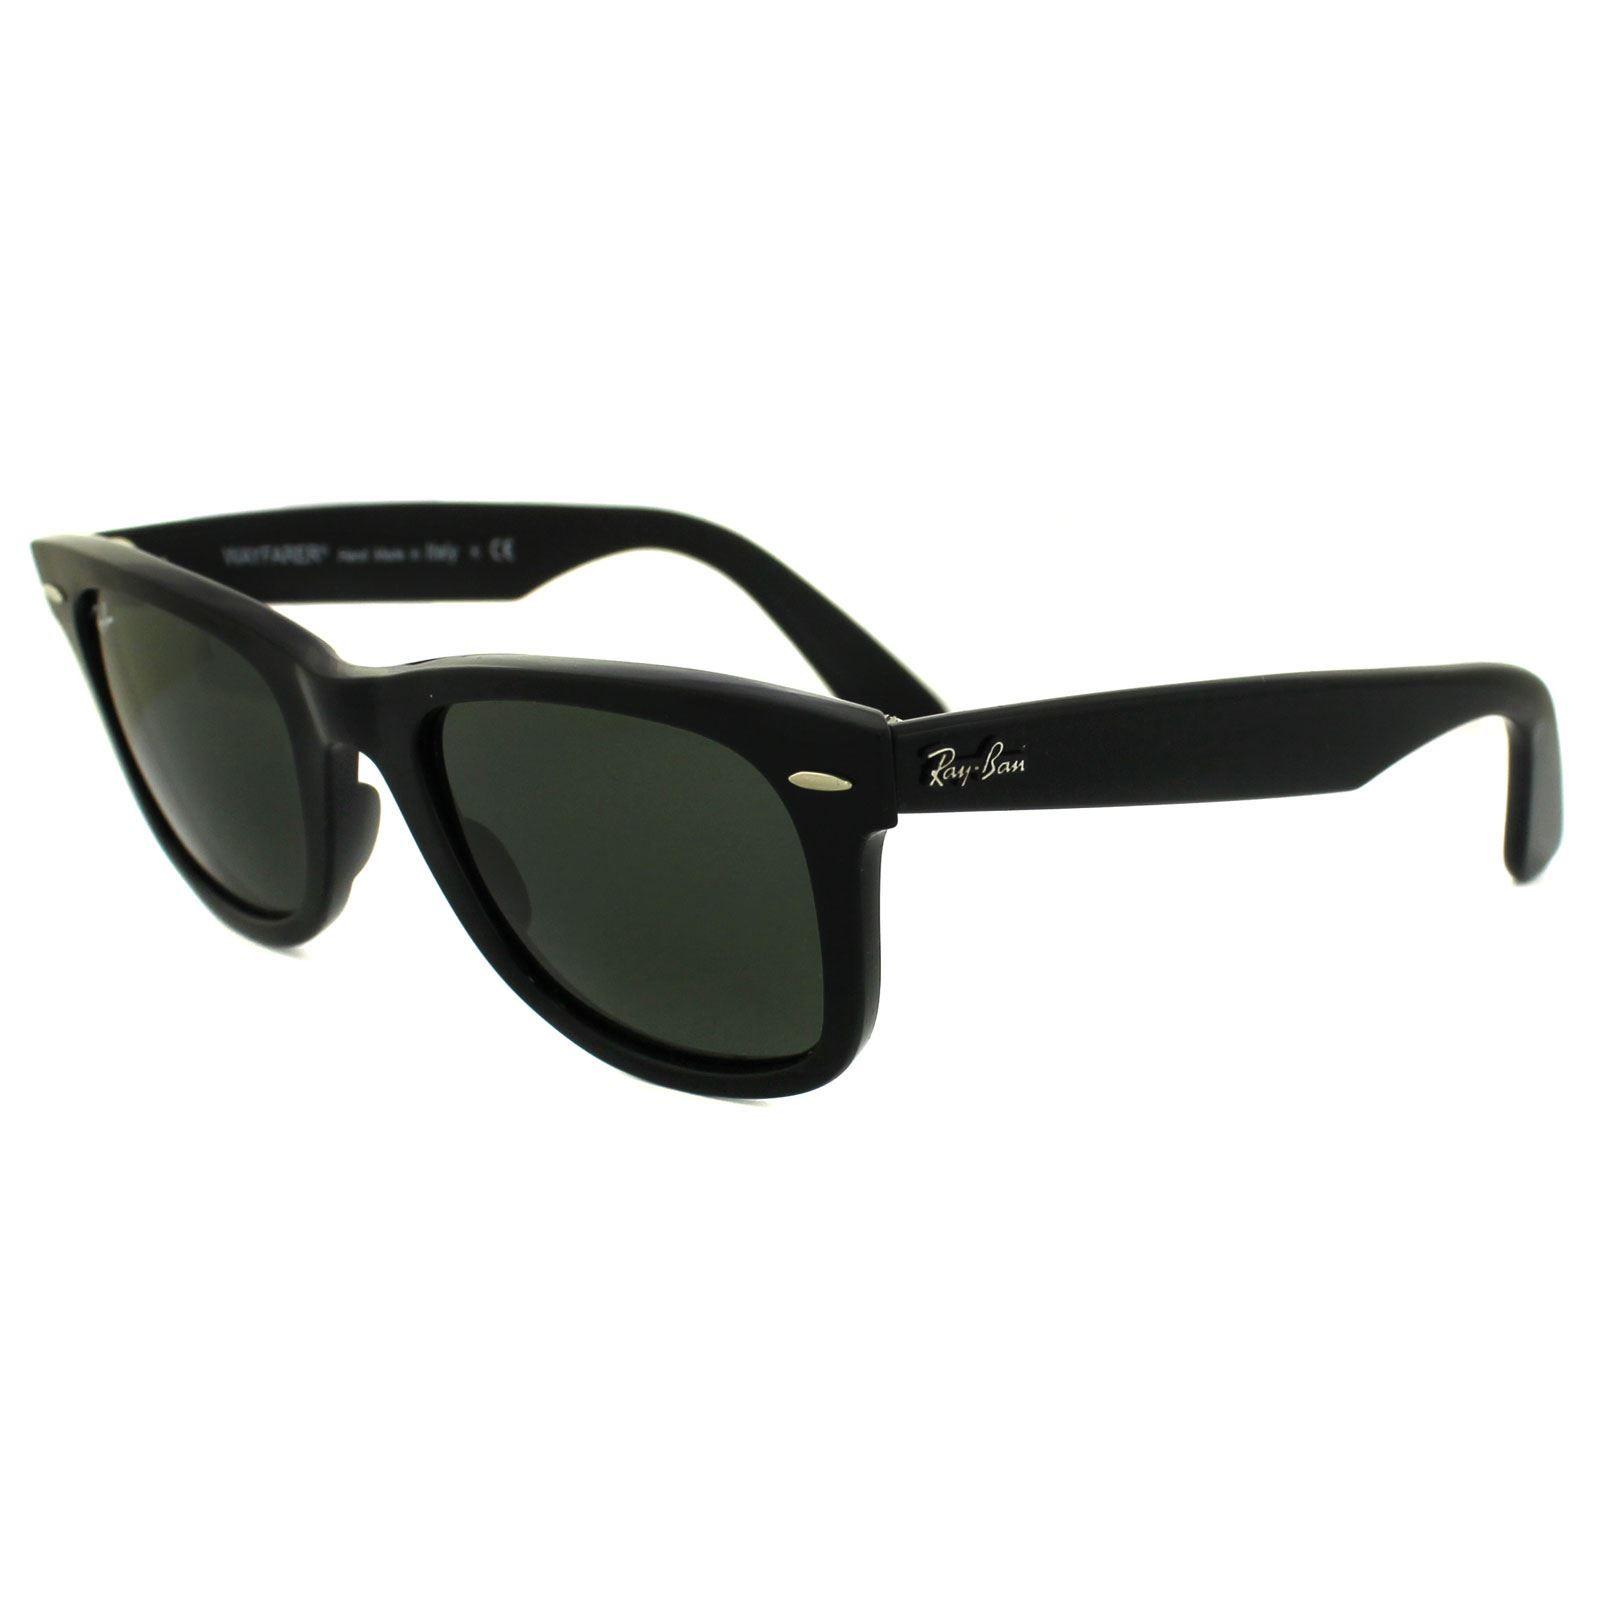 Ray-Ban Sunglasses Wayfarer 2140 901 Black Green G-15 Medium 50mm